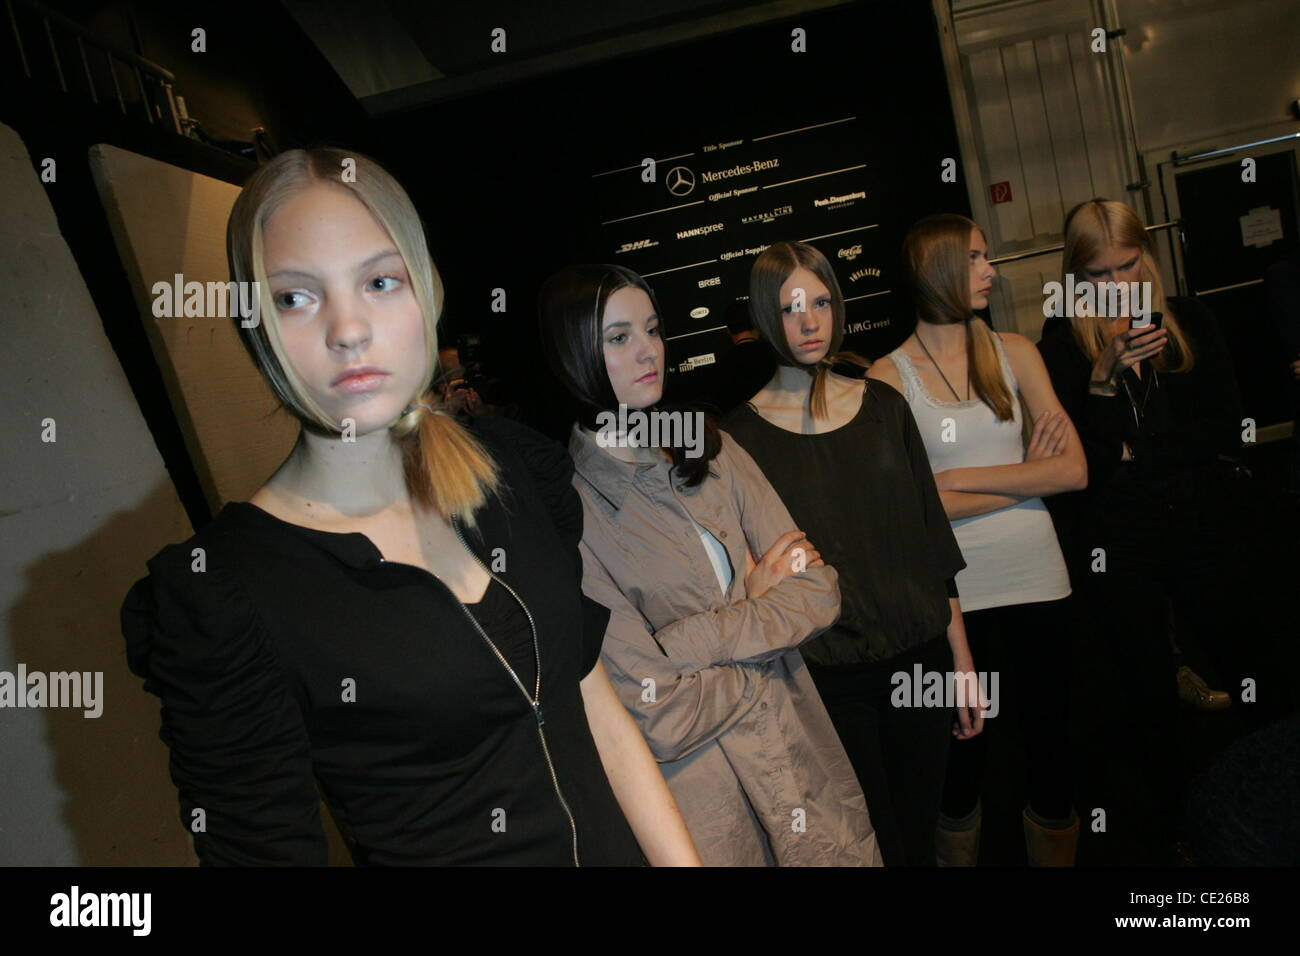 Models - Backstage - Dawid Tomaszewski fashion show at Mercedes Benz Fashion Week Berlin Autumn/Winter 2011 at the - Stock Image